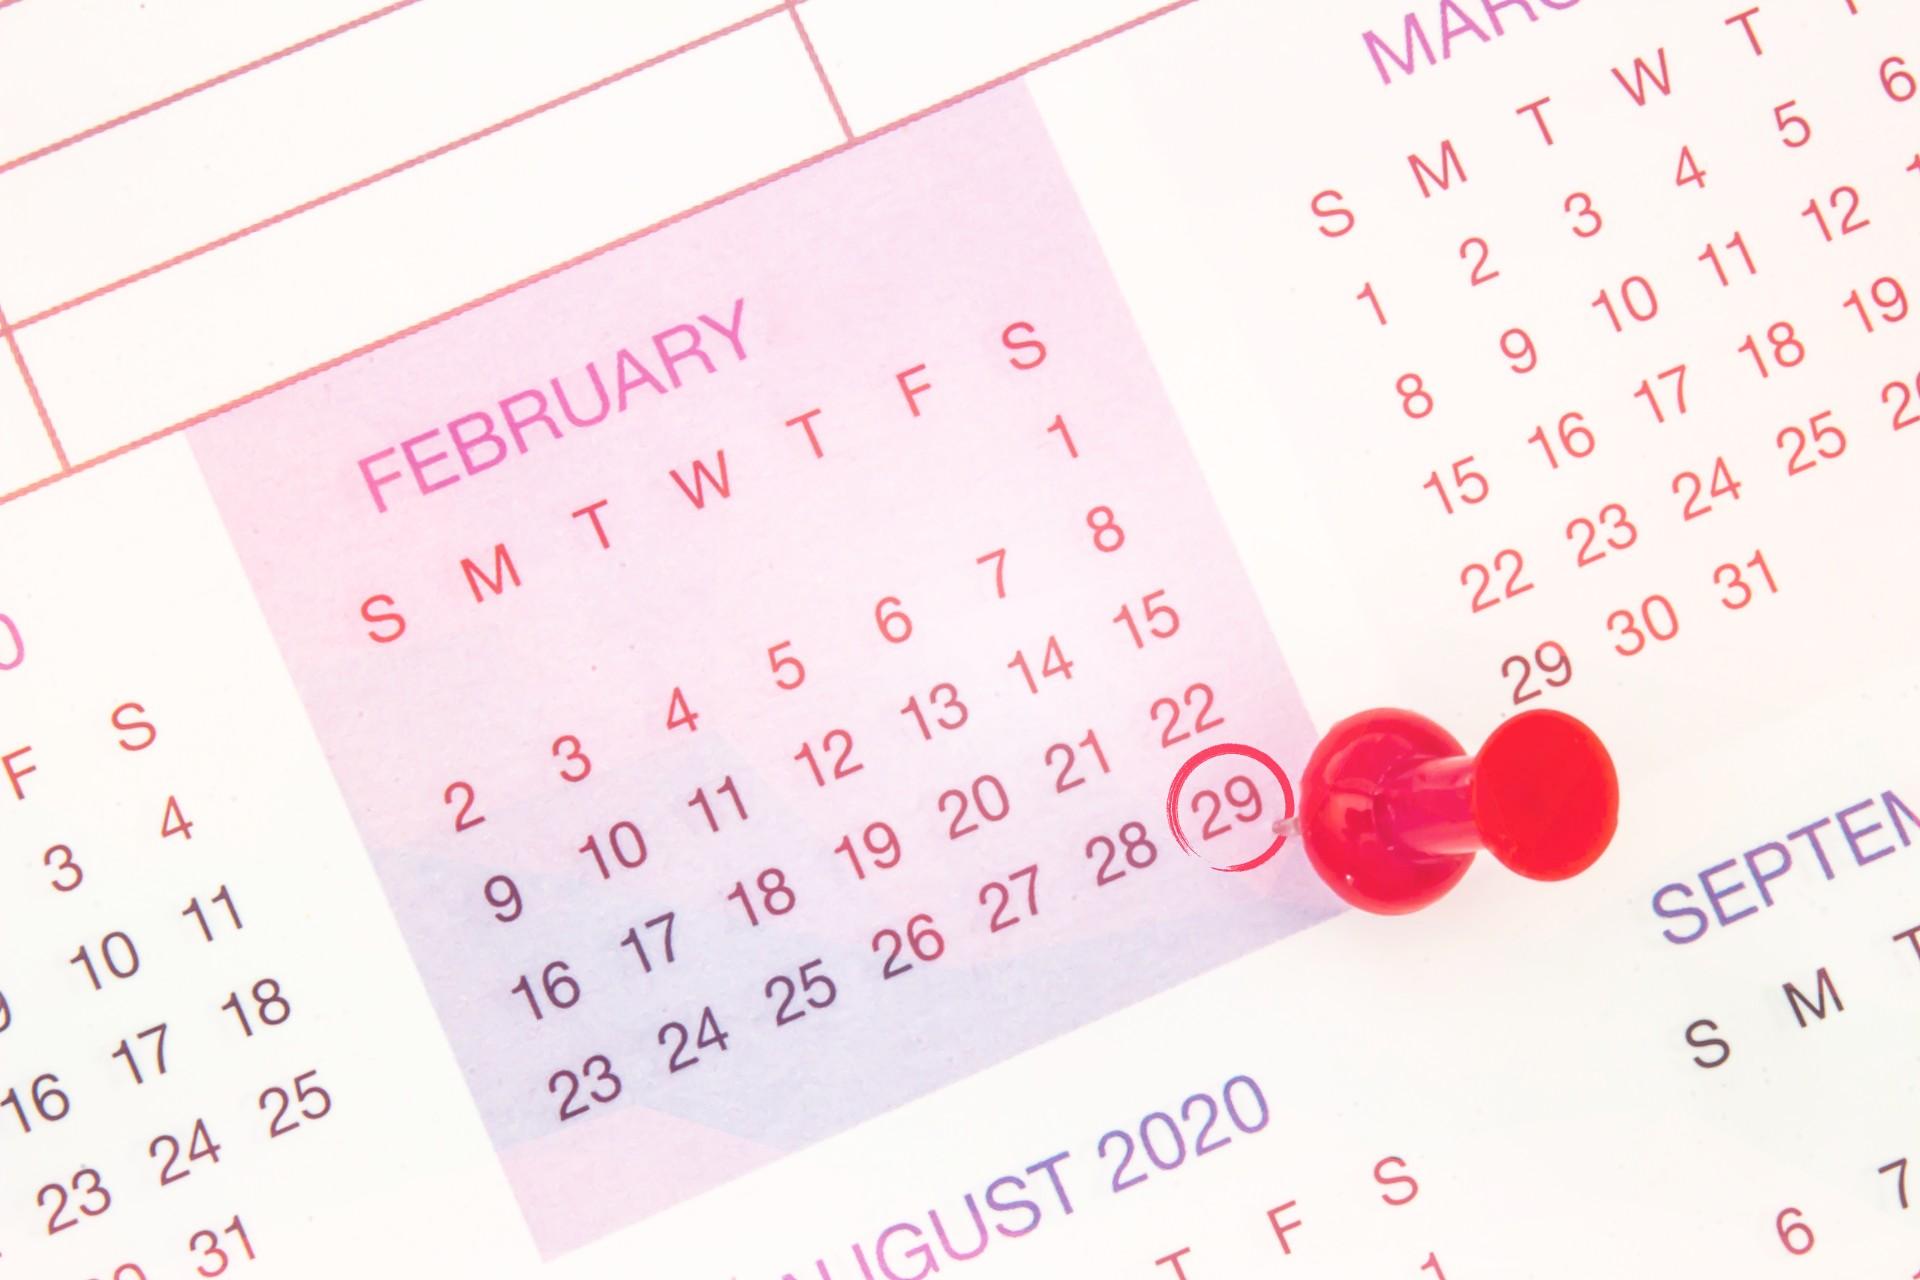 Calendar showing February 29.